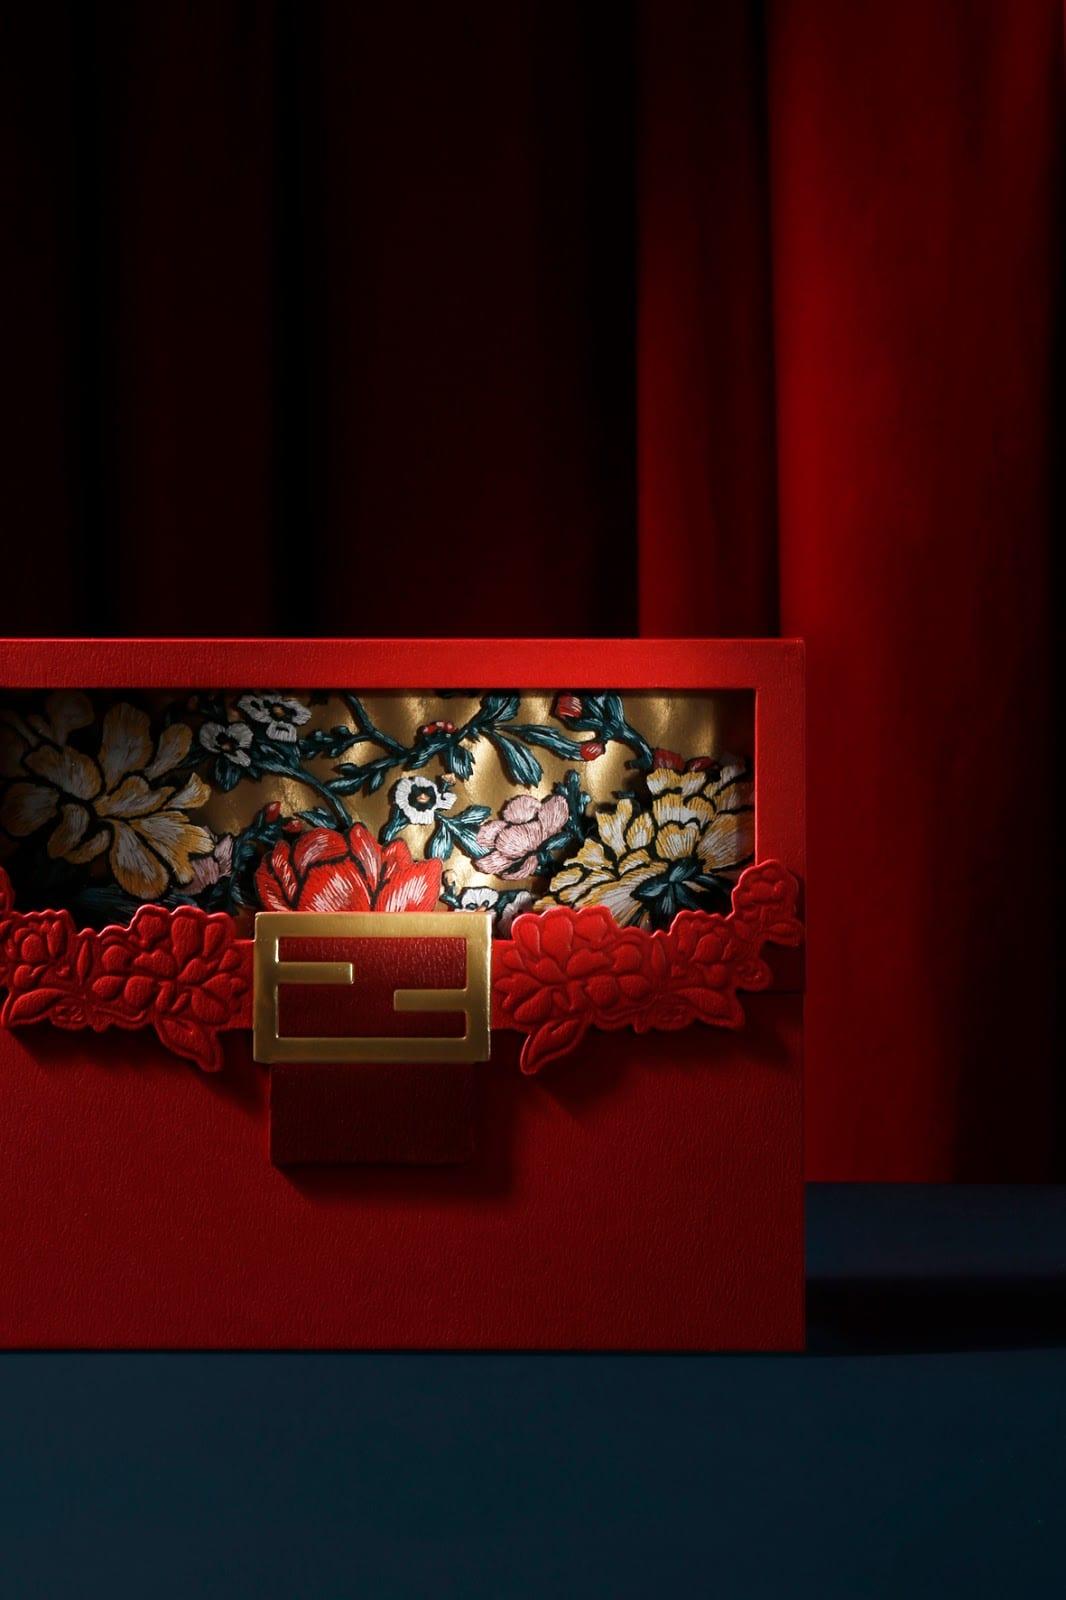 fendi cny delux 02 - Fendi Red Packet 2019